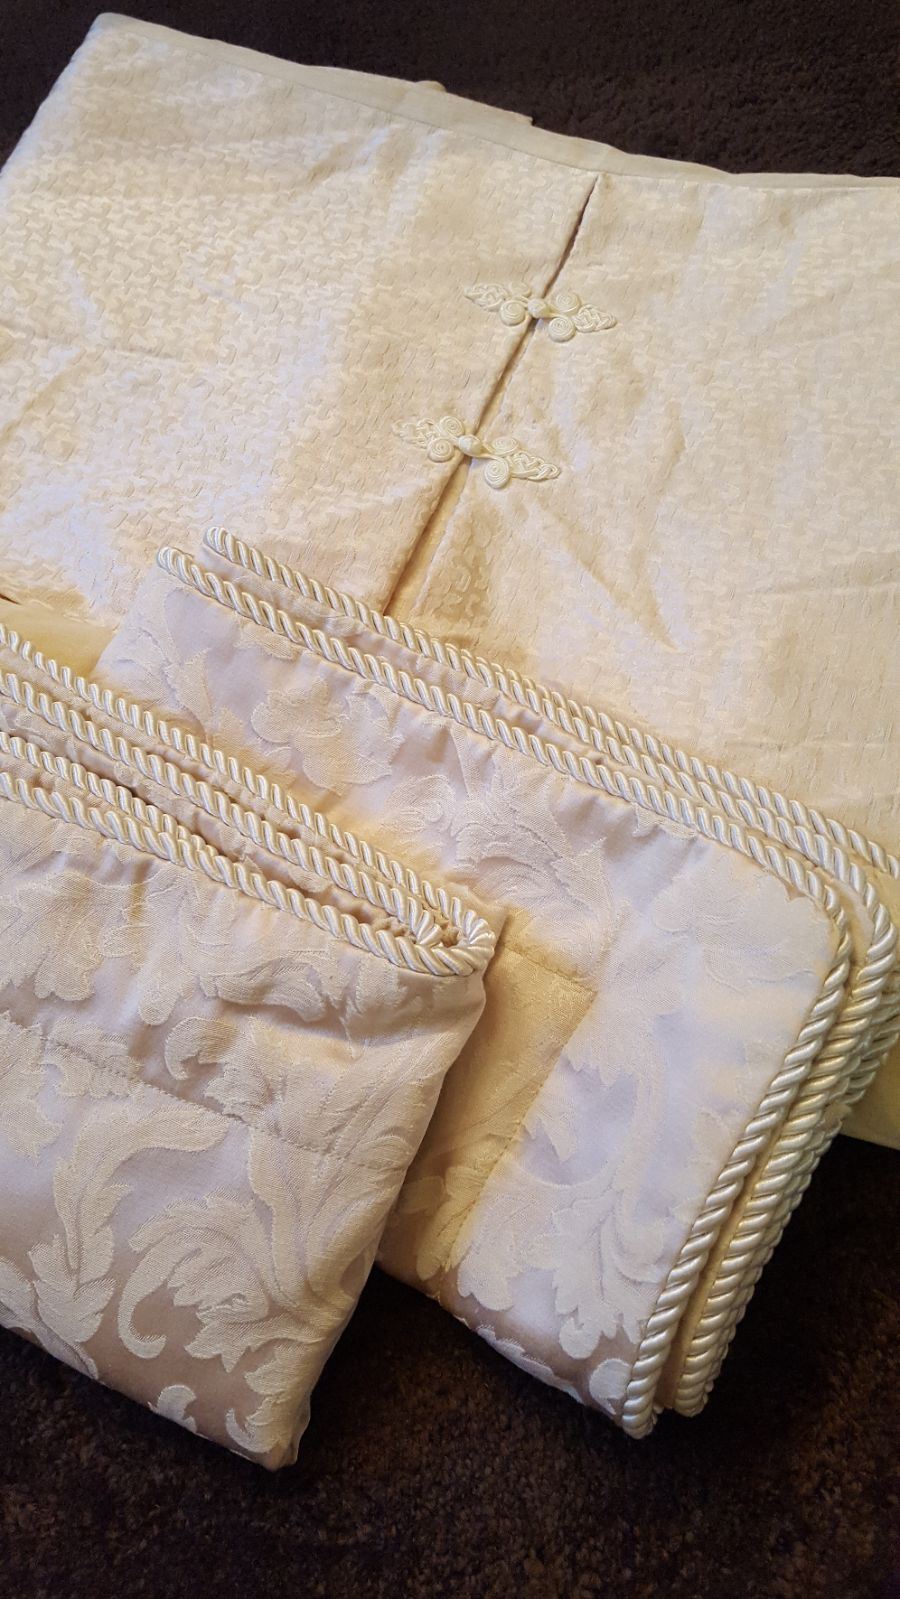 Pillow shams and bed skirt set